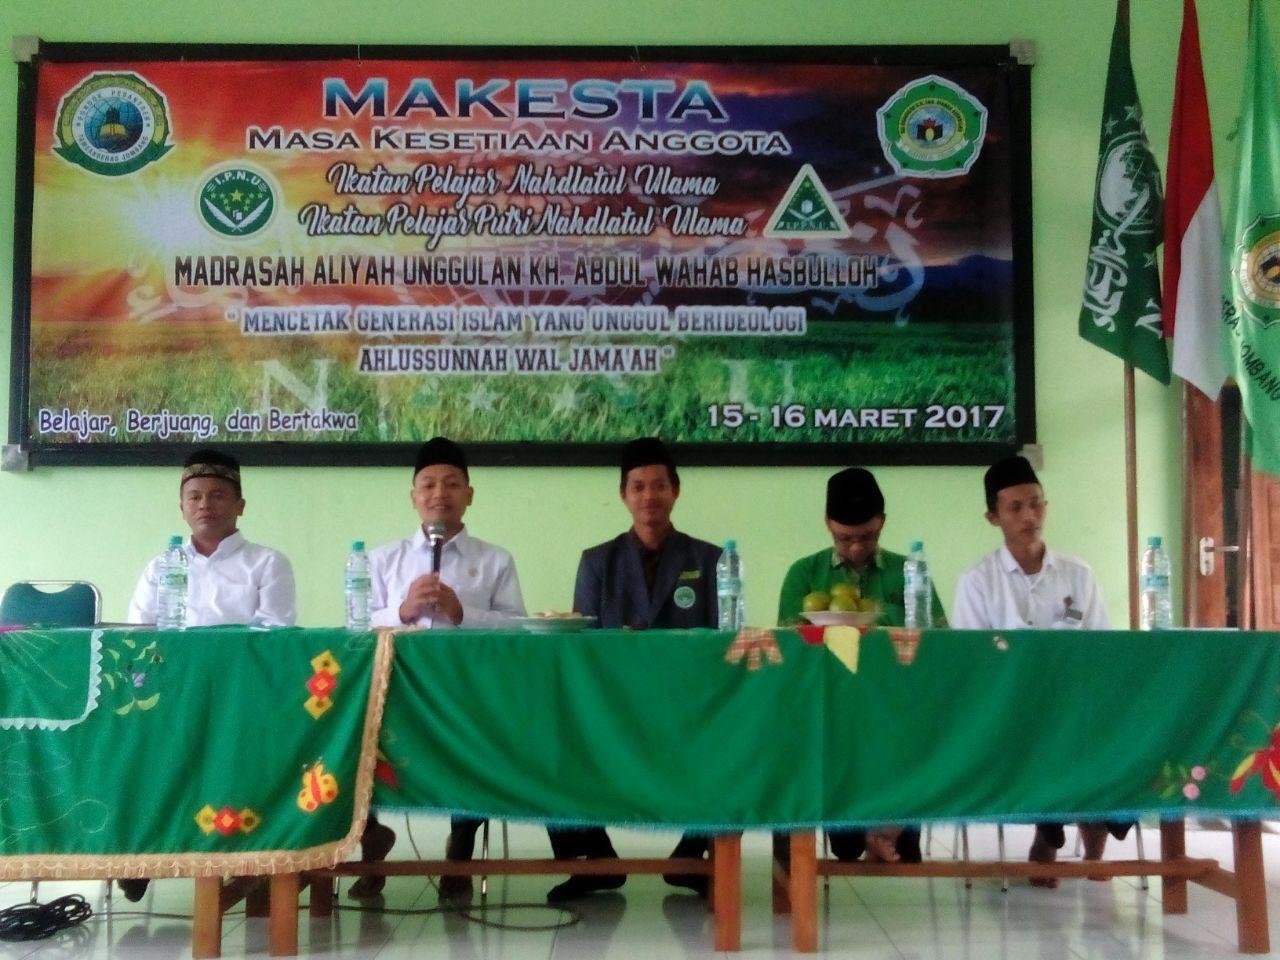 Makesta: Bekal Awal Kader Nahdlatul Ulama